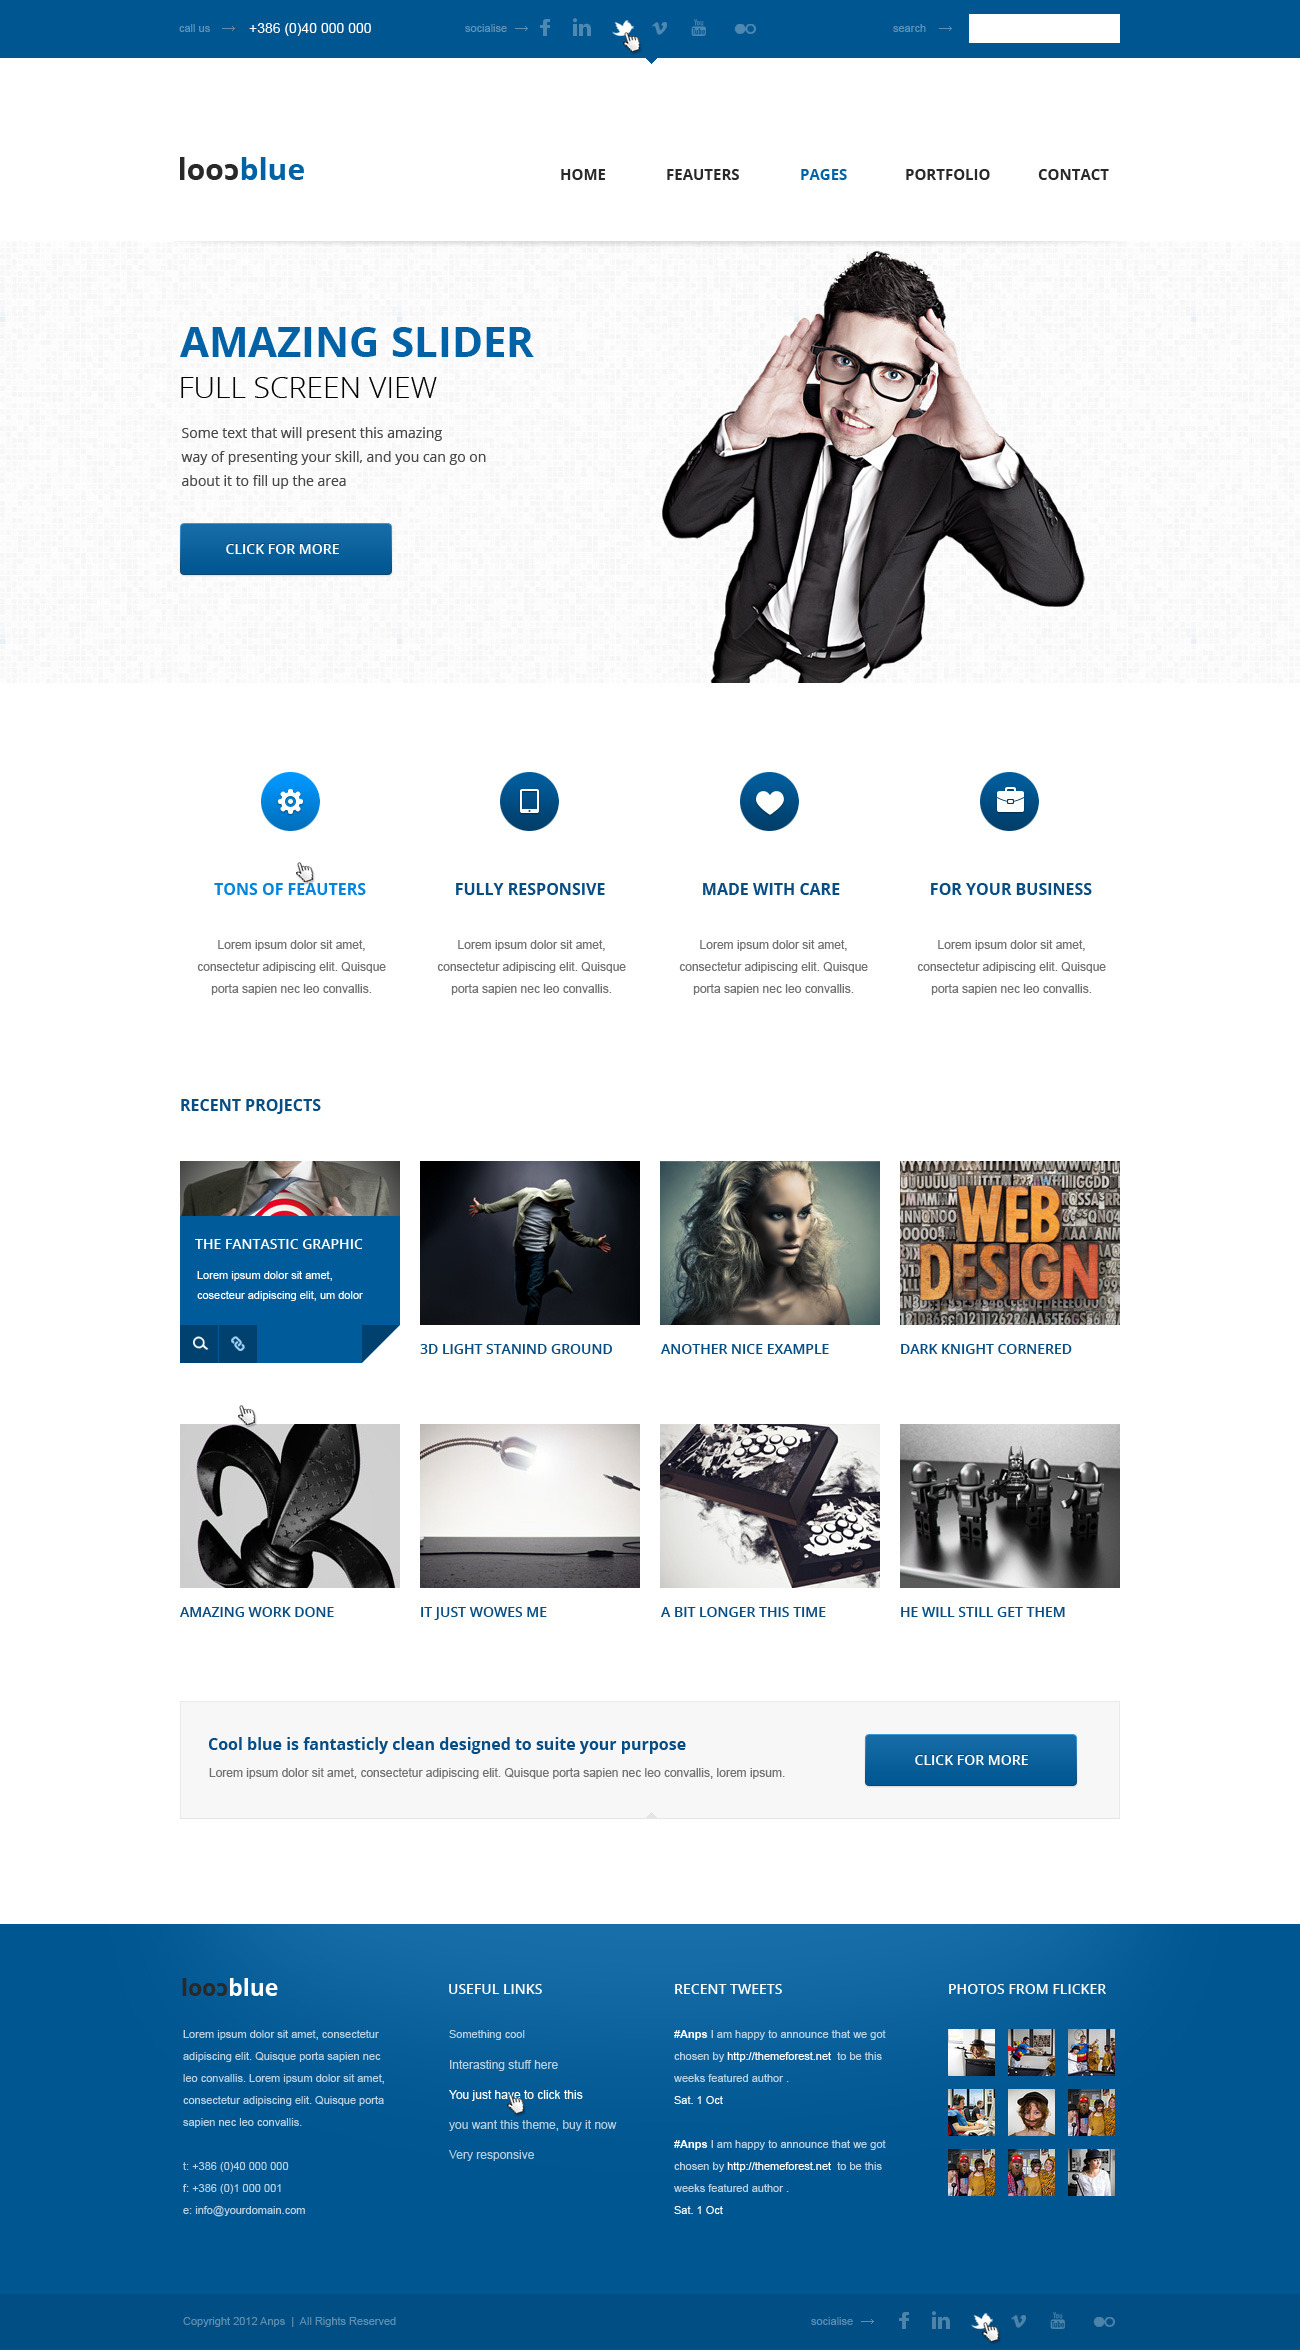 Coolblue - Responsive Multipurpose Wordpress theme